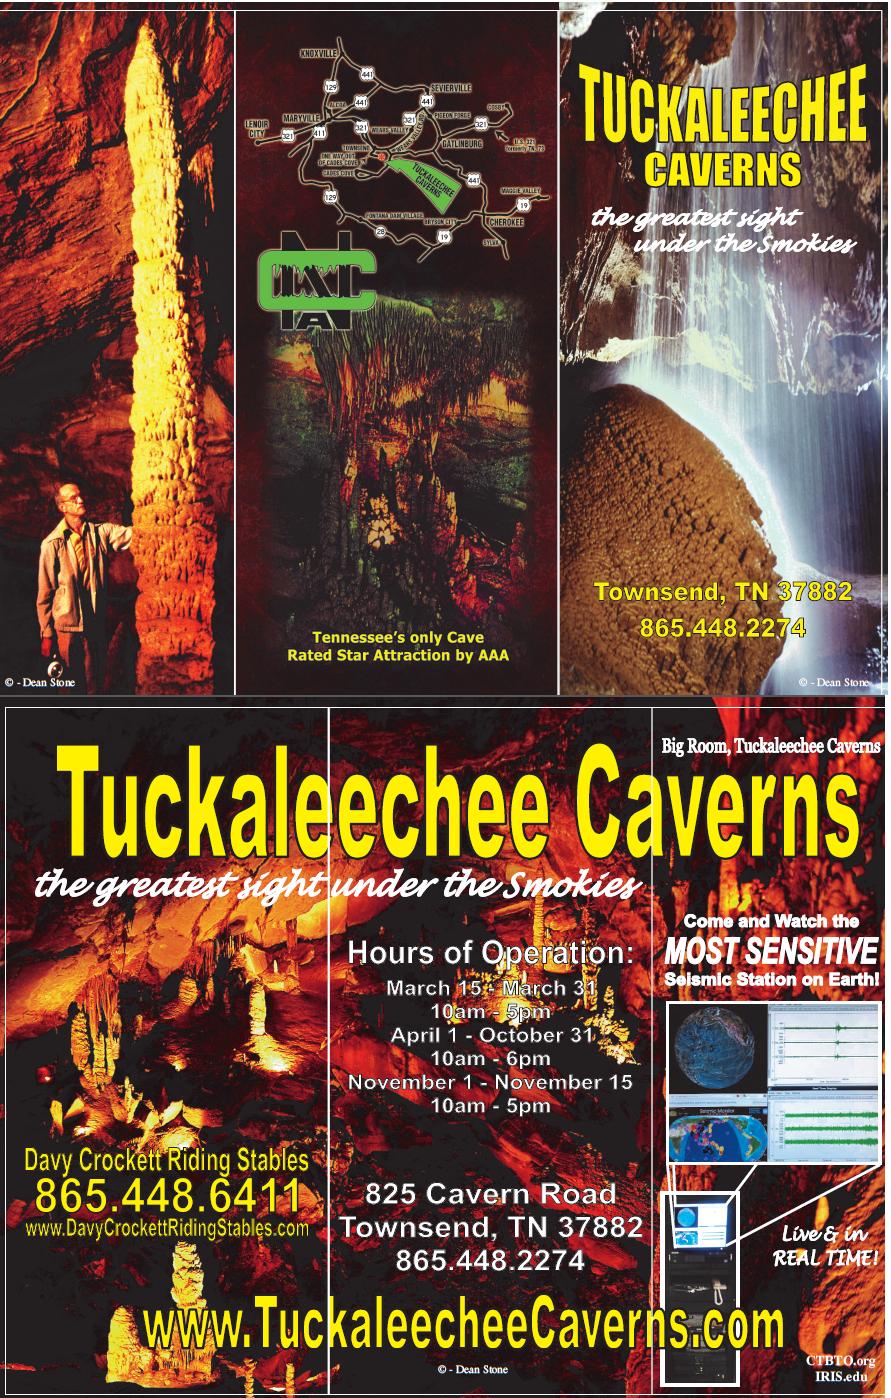 Tuckaleechee Caverns Brochure